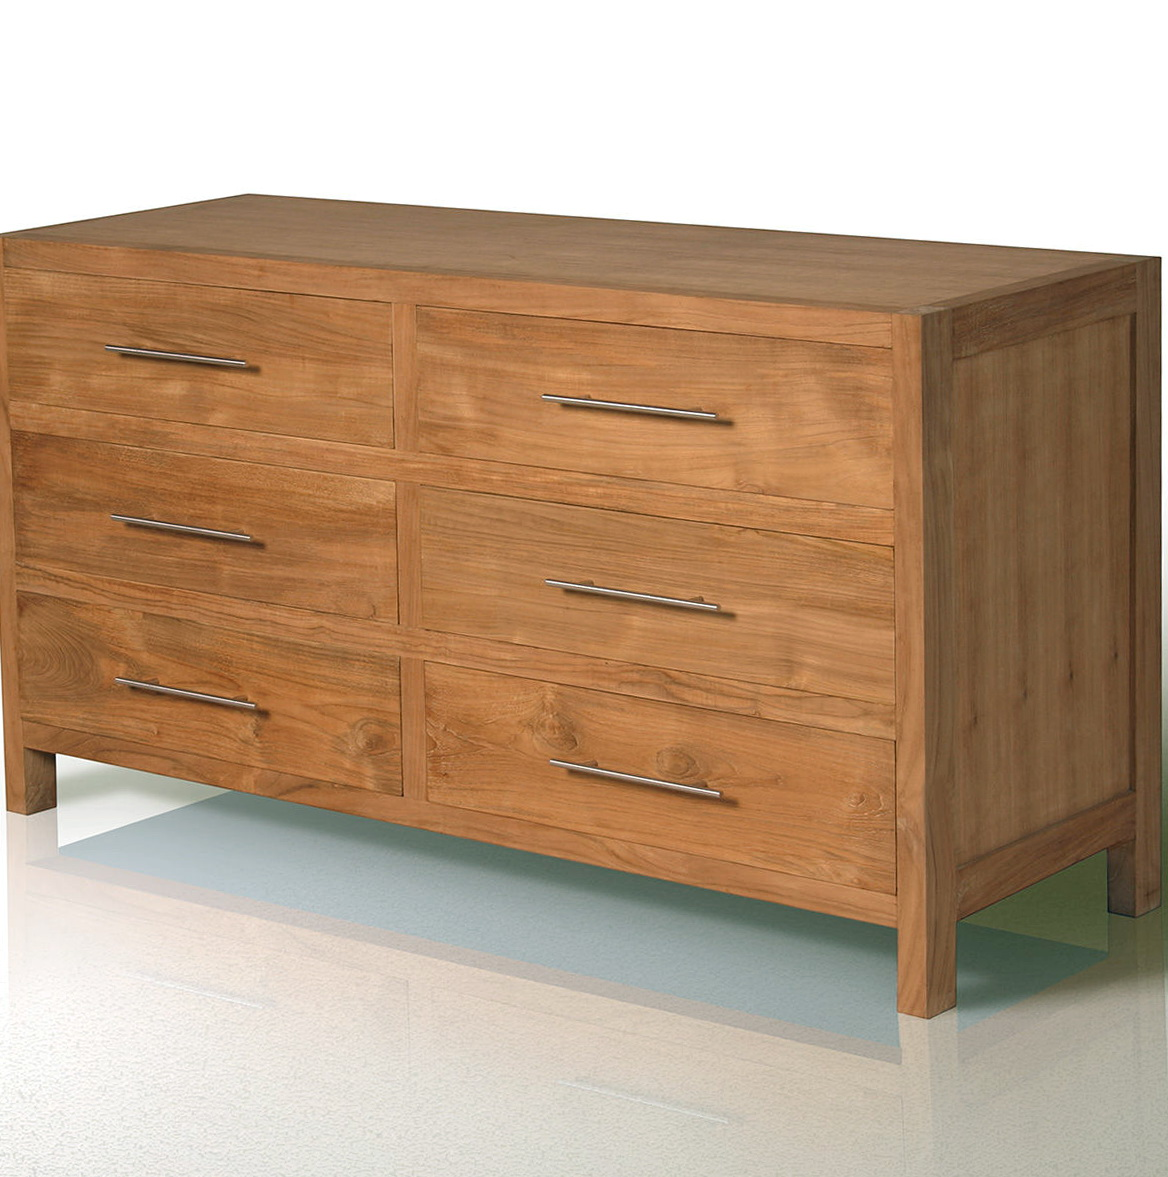 Solid Wood Dressers